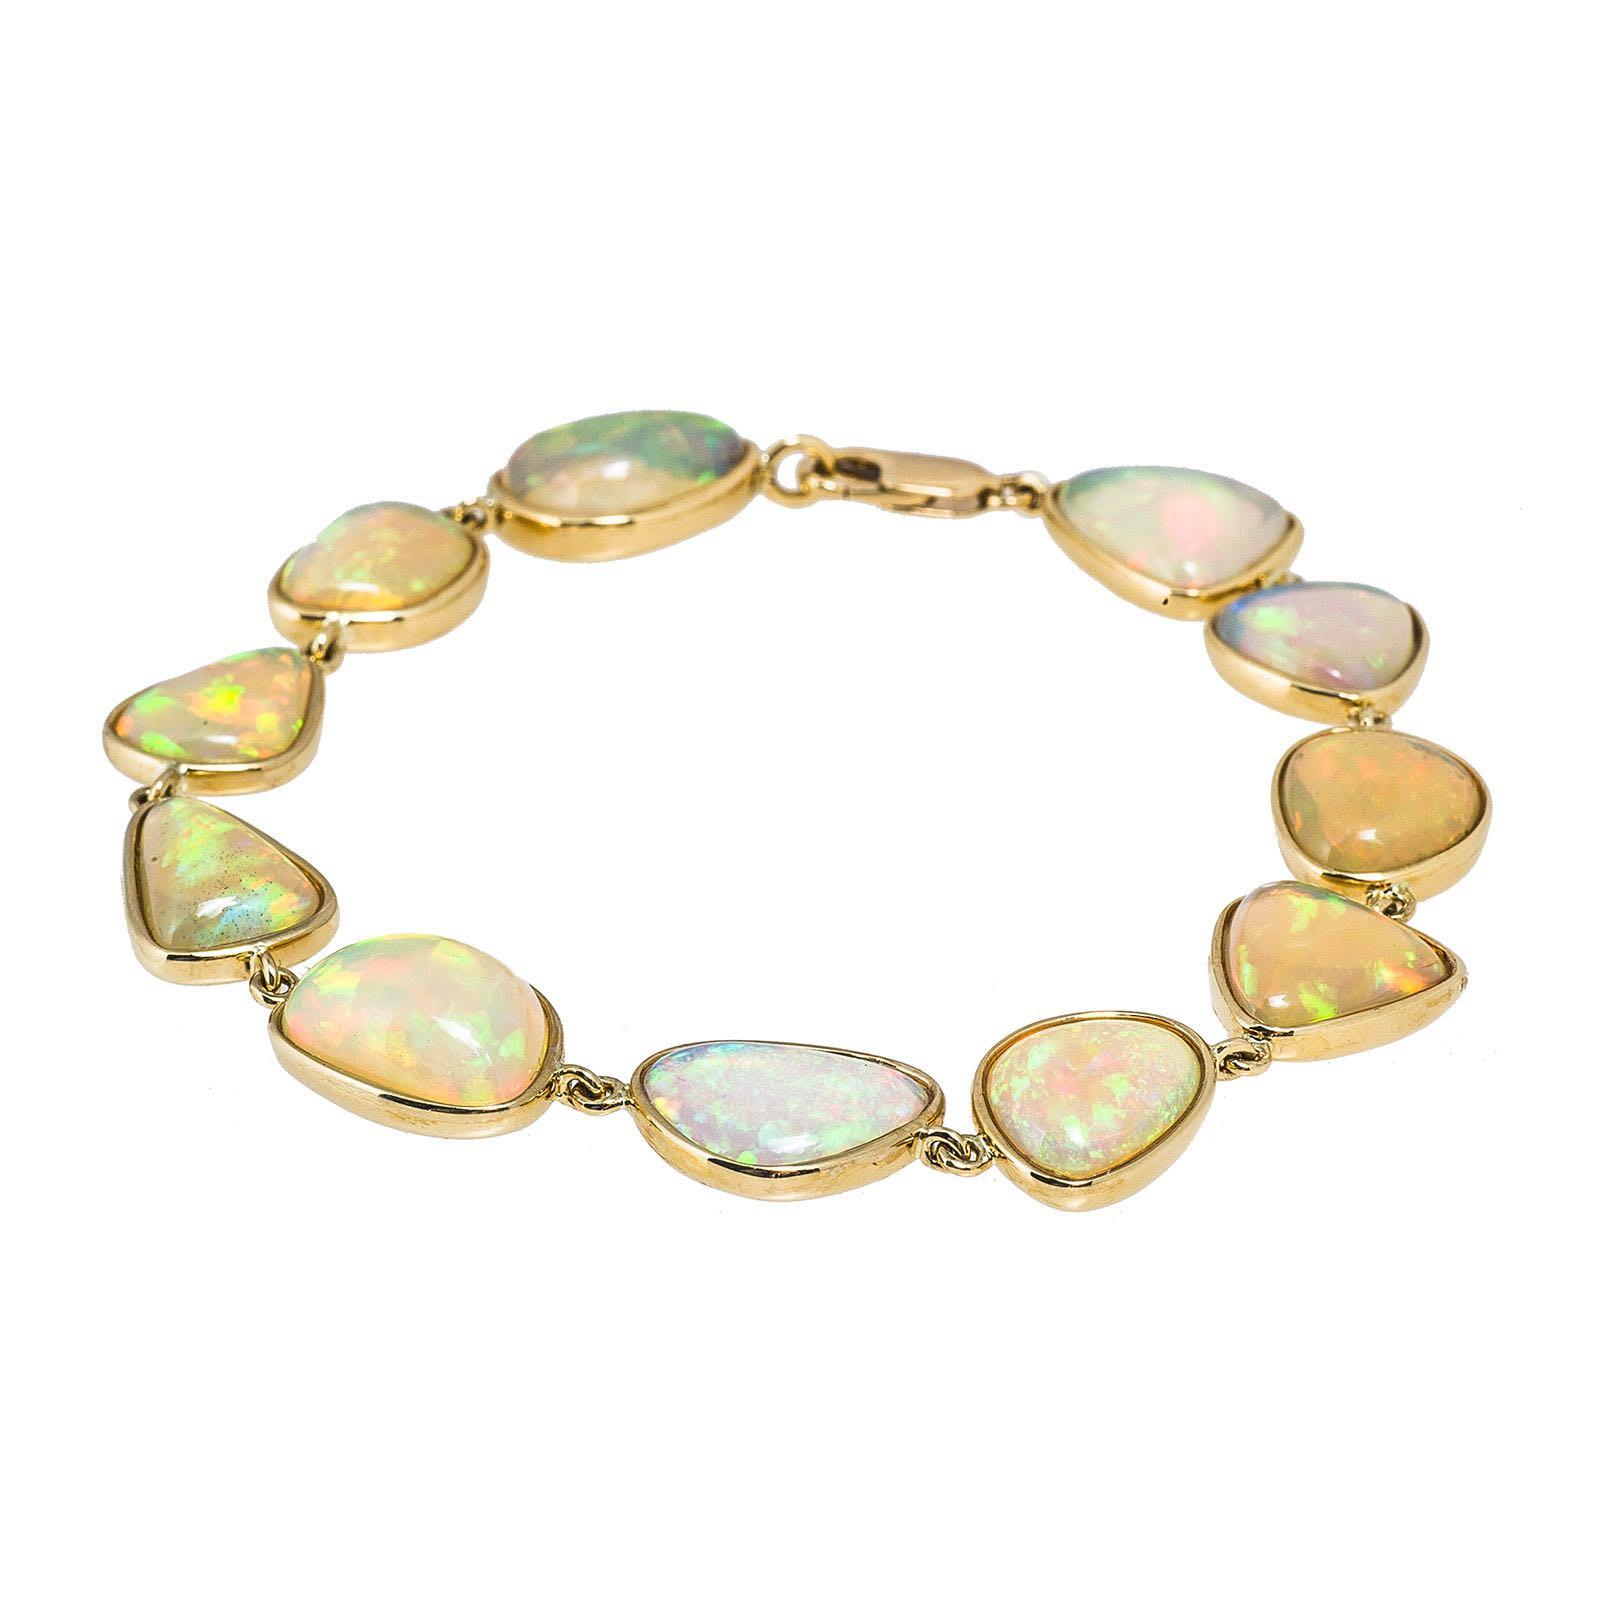 New 31.73 CTW Opal Bracelet